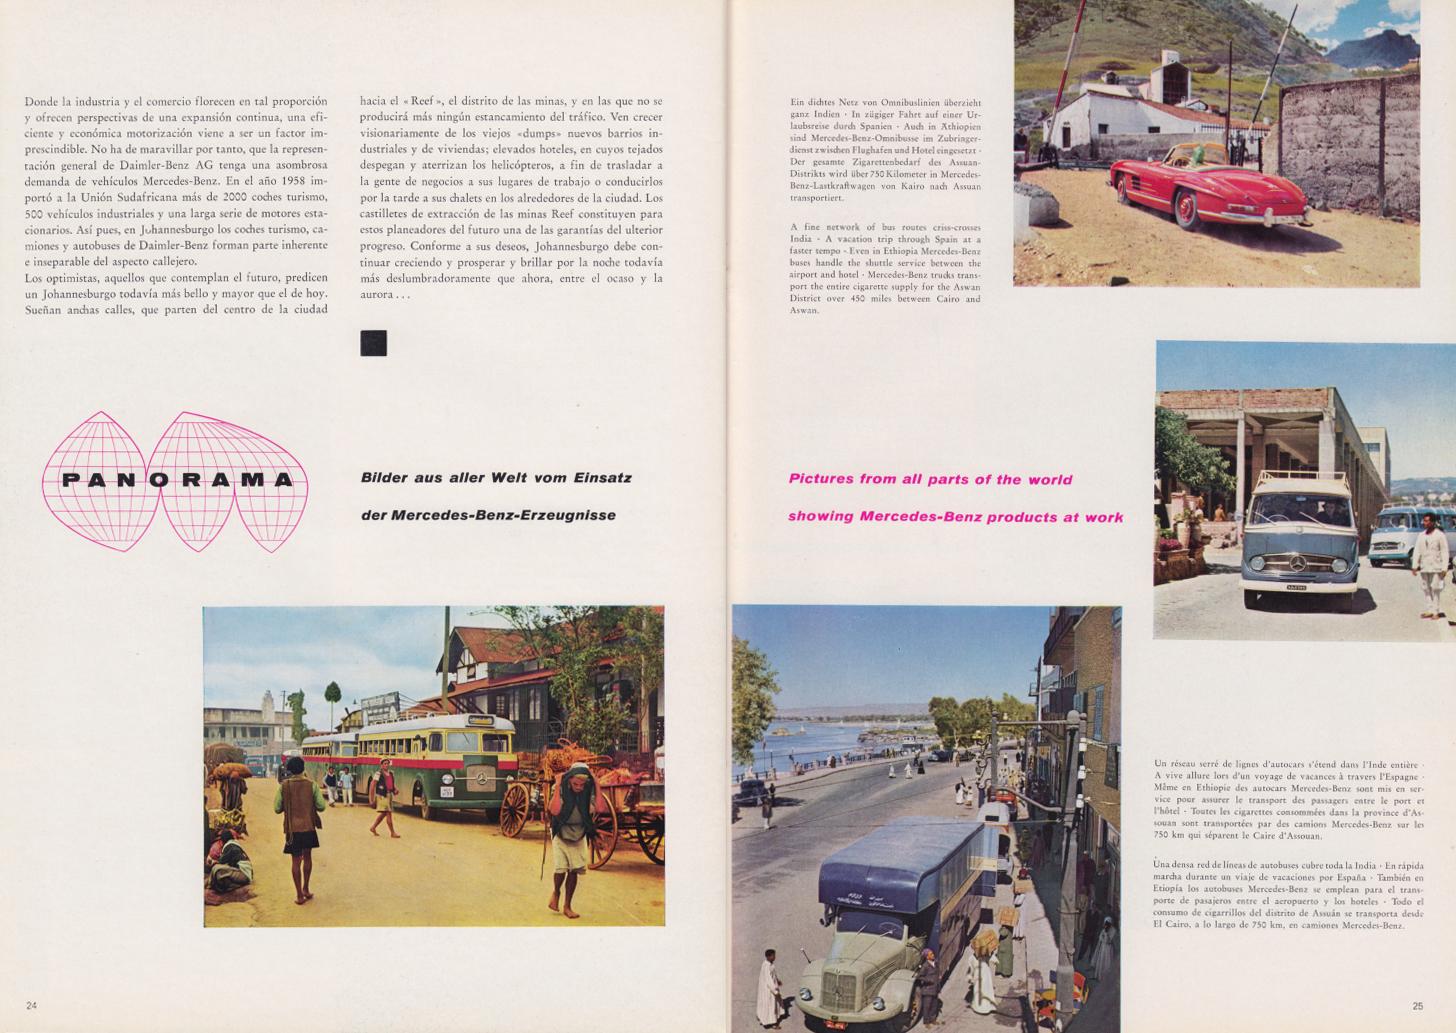 (REVISTA): Periódico In aller welt n.º 34 - Mercedes-Benz no mundo - 1959 - multilingue 013